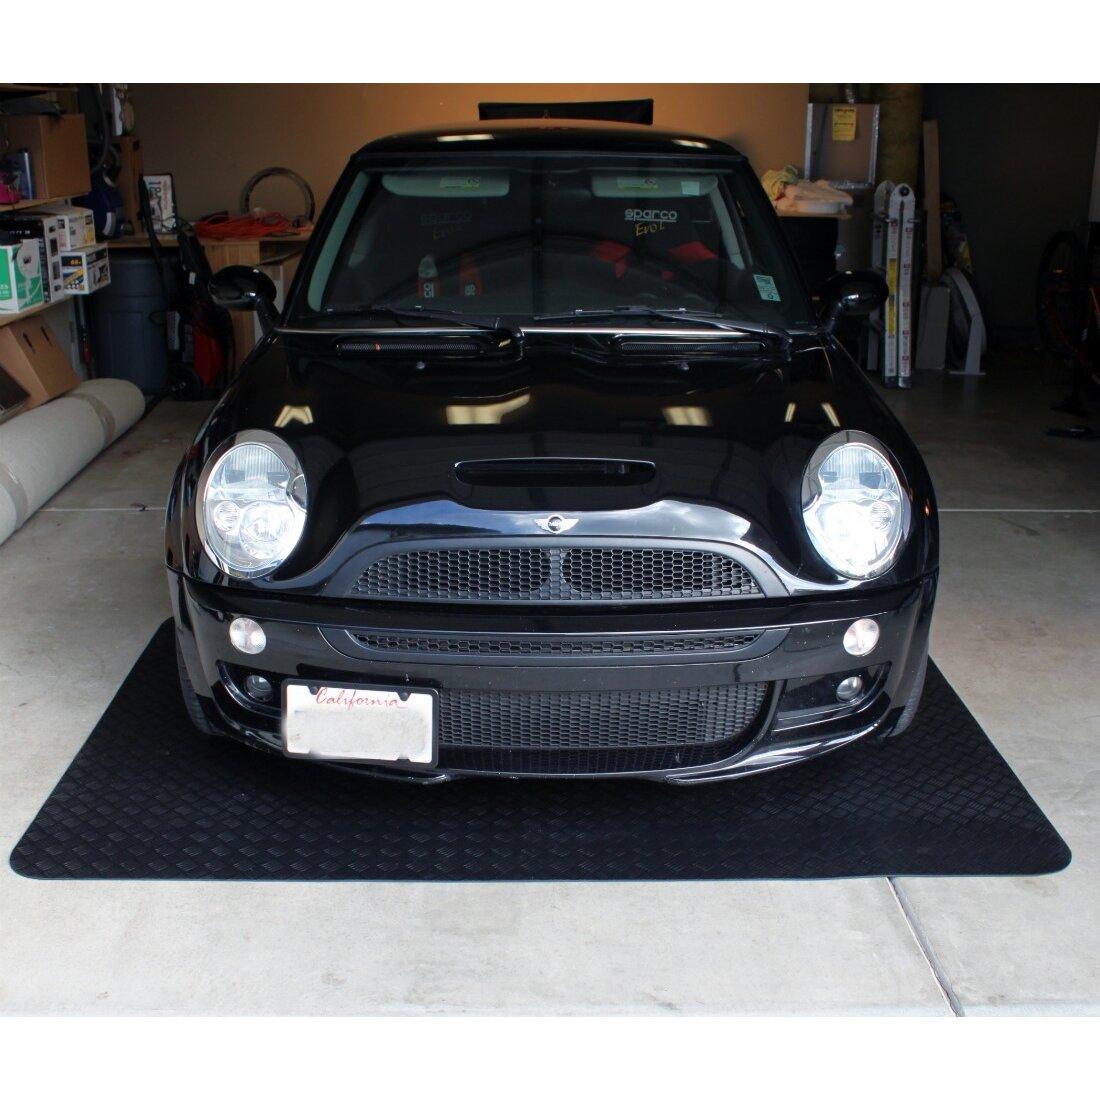 Symple Stuff Autoguard Garage Floor Protection Utility Mat